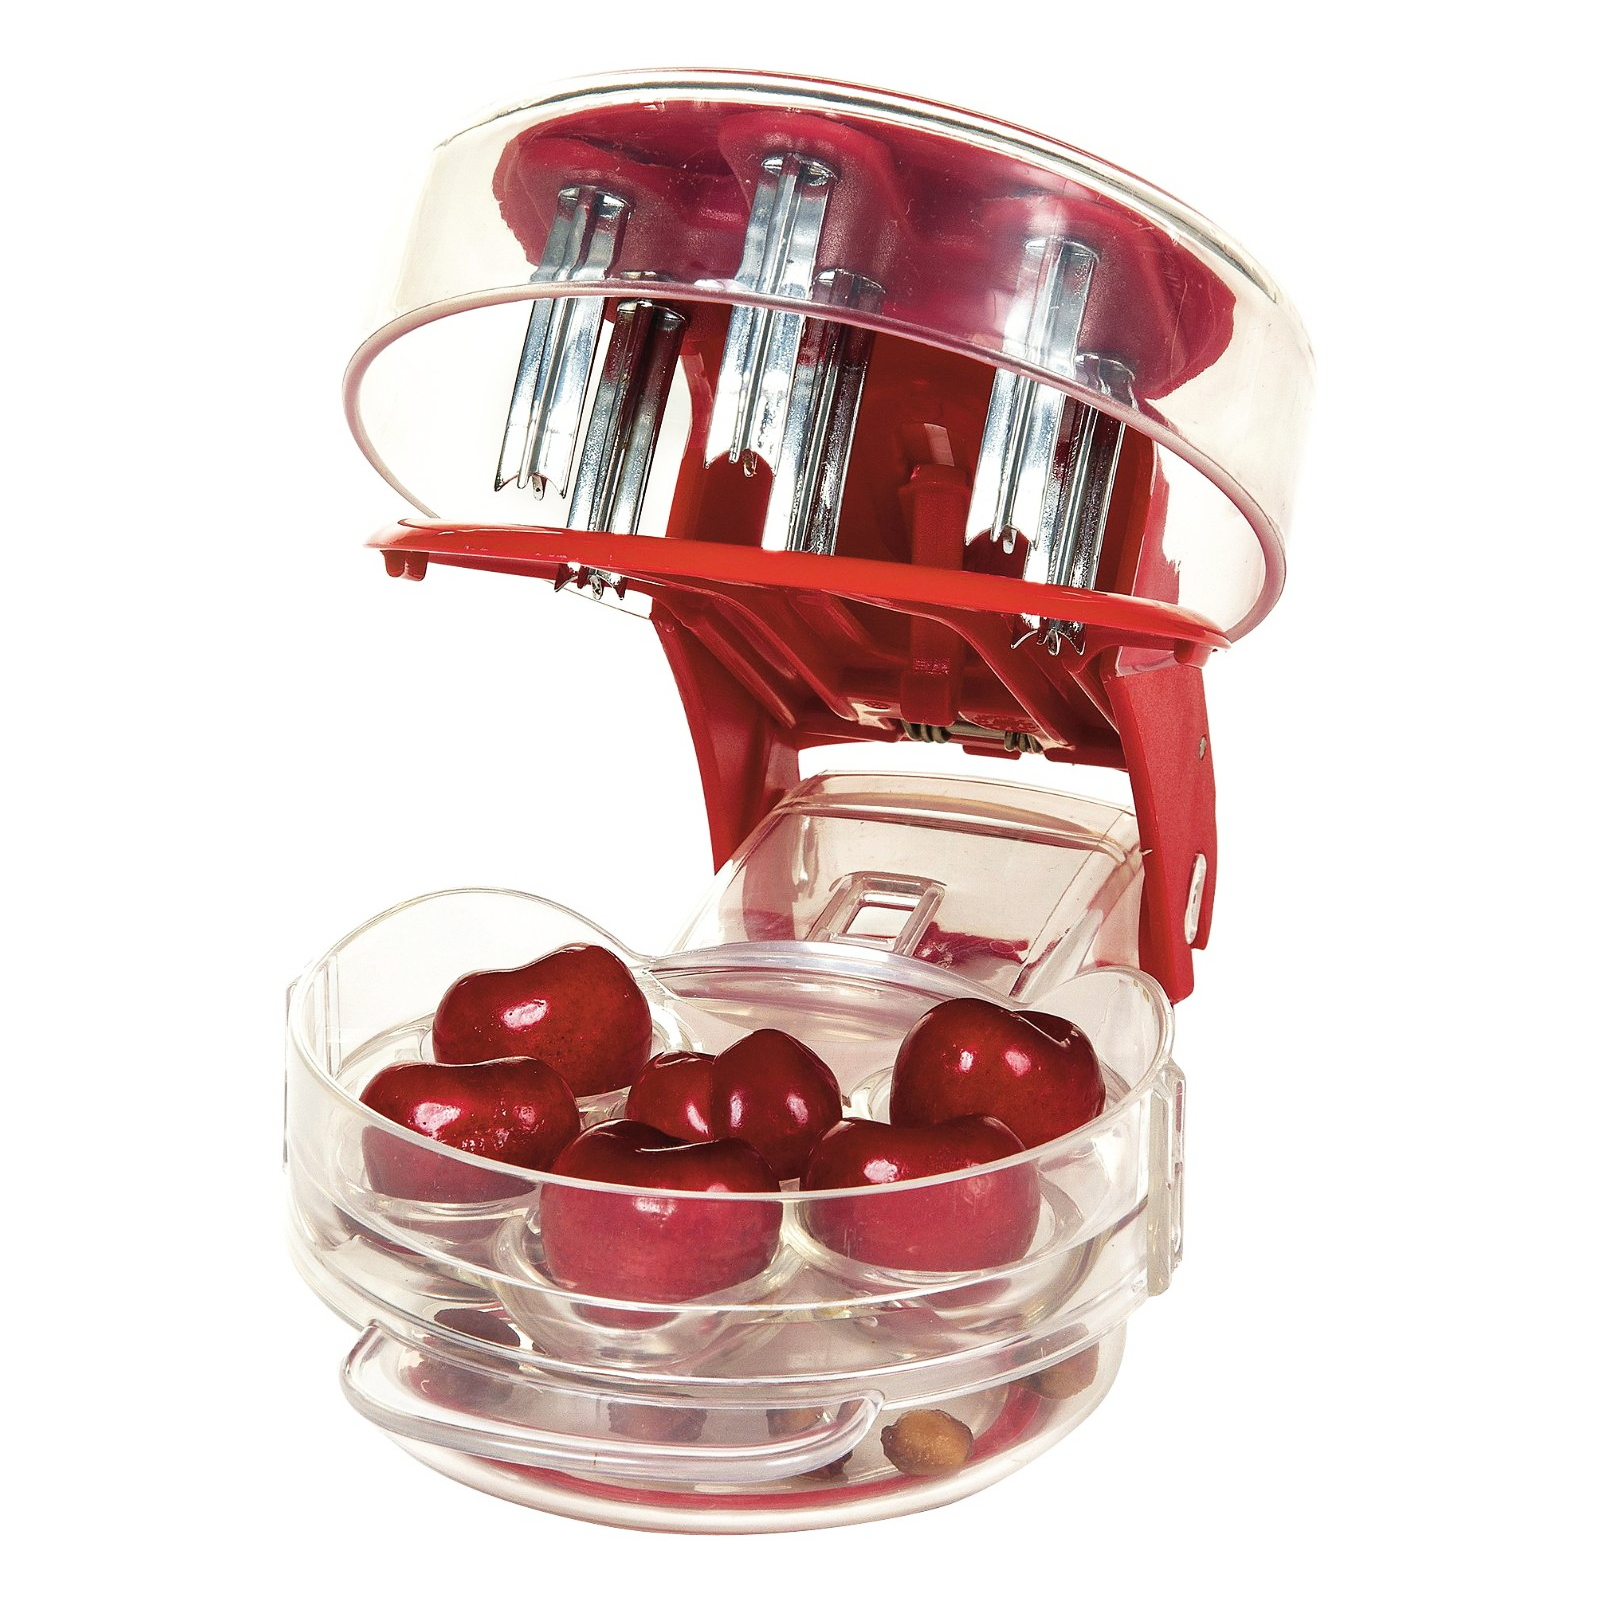 Progressive Prepworks Red Cherry Pitter